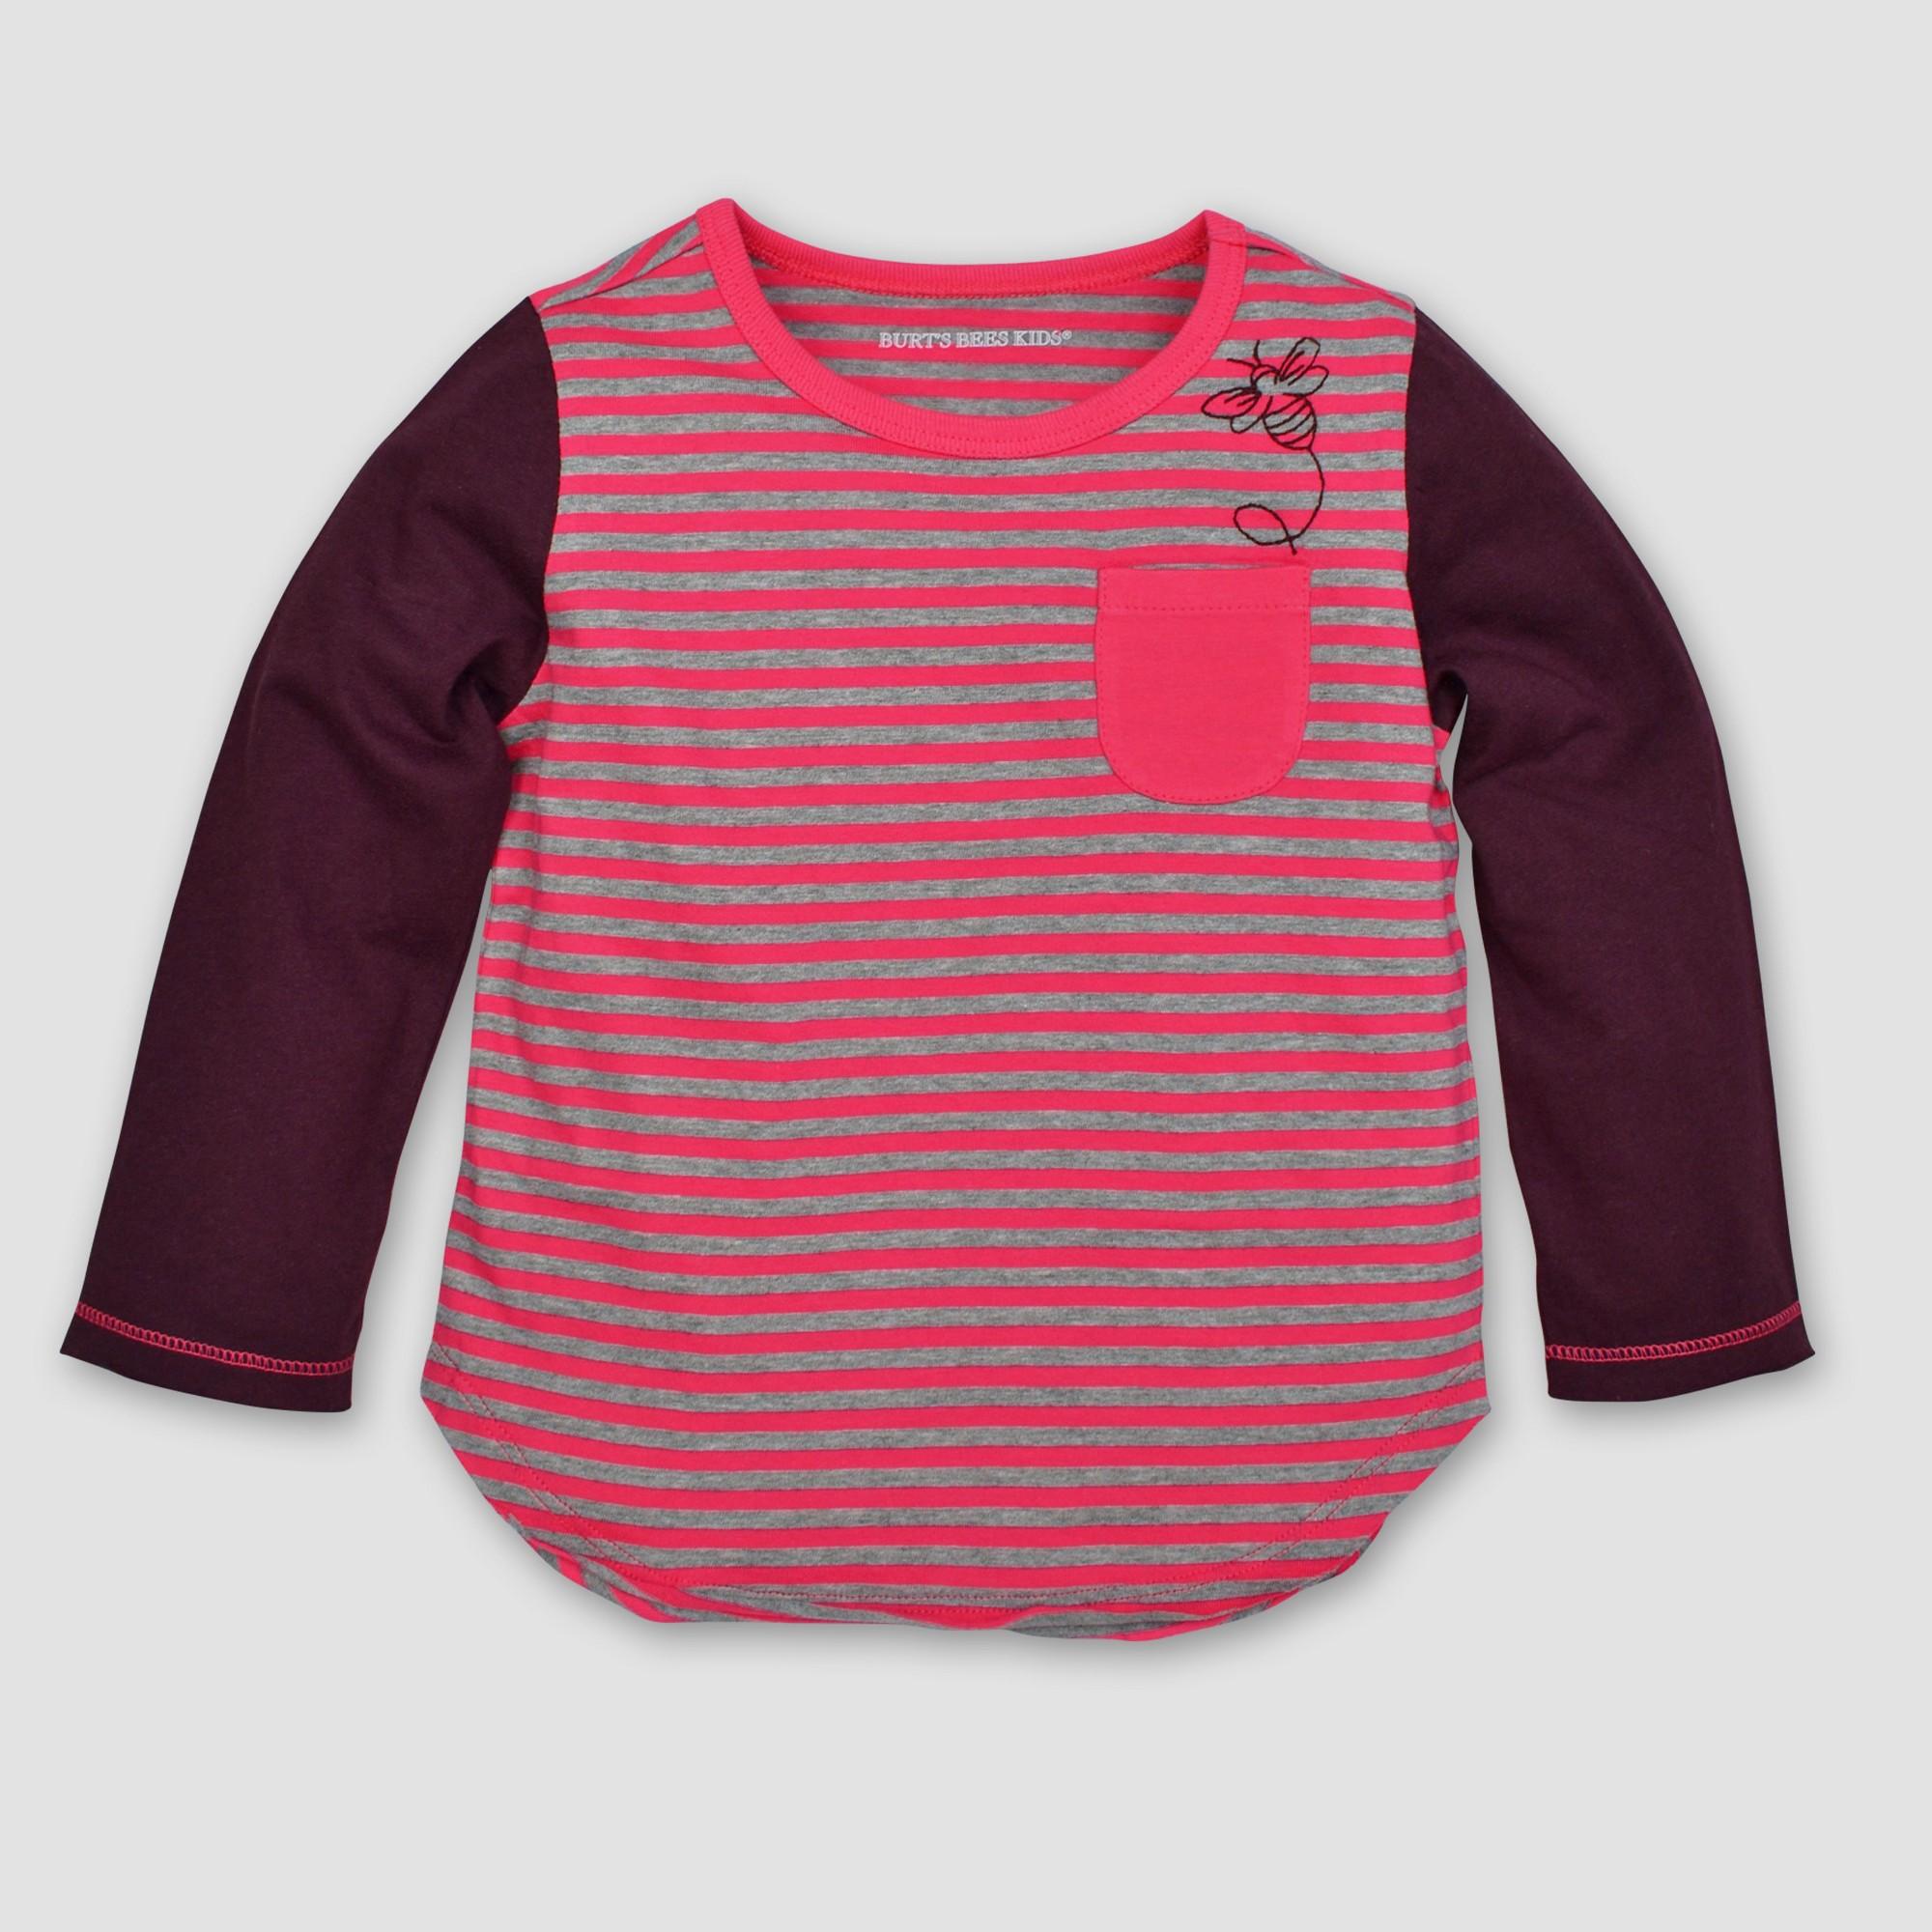 Burt's Bees Baby Toddler Girls' Striped Pocket Long Sleeve T-Shirt - Magenta 4T, Purple